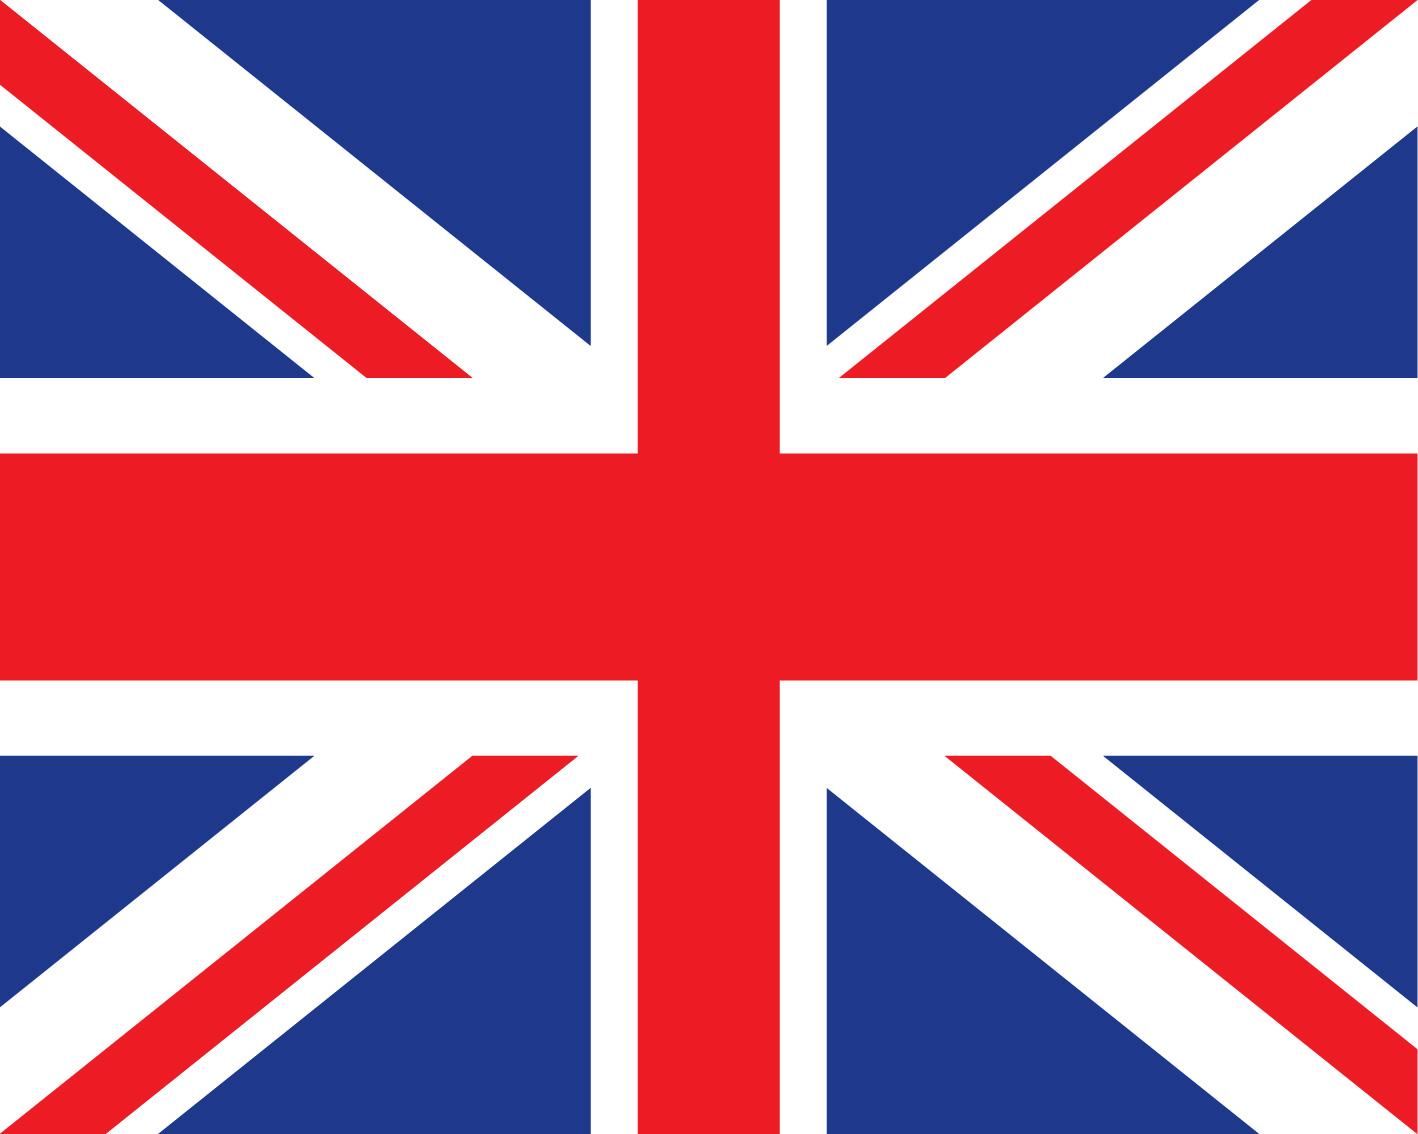 Flag_Series-02